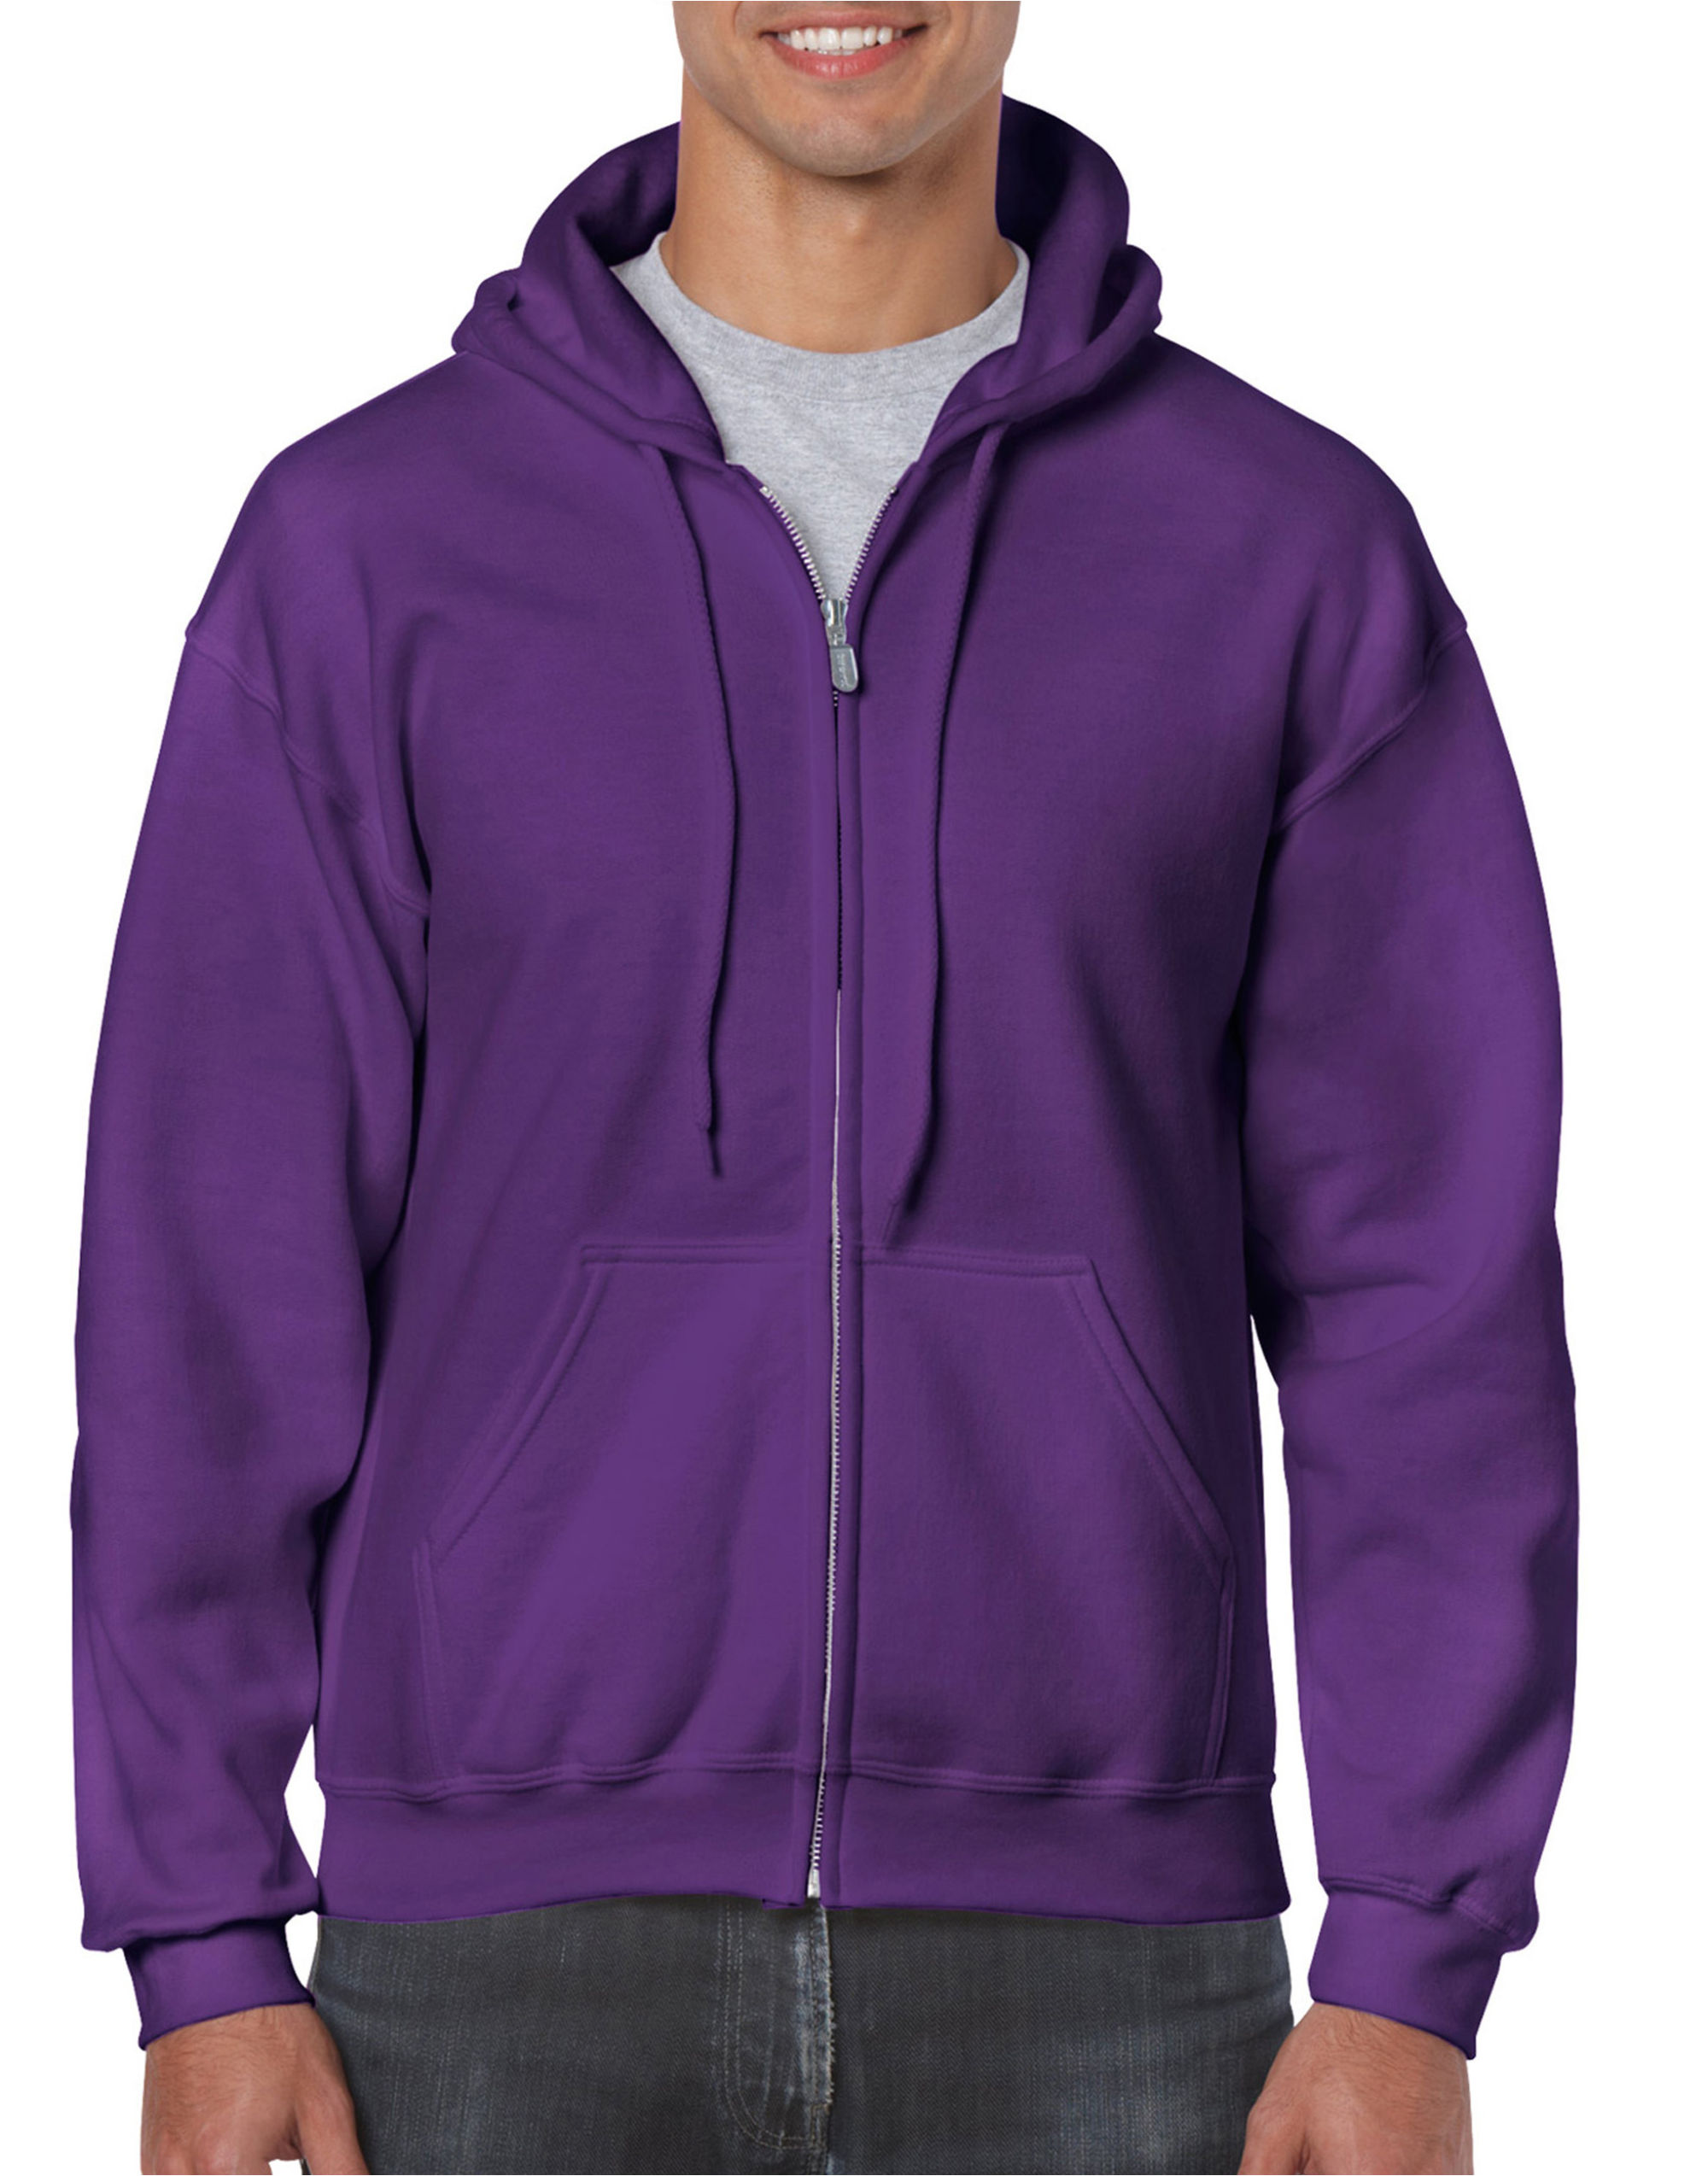 Heavy Blend  Adult Full Zip Hooded Sweatshirt